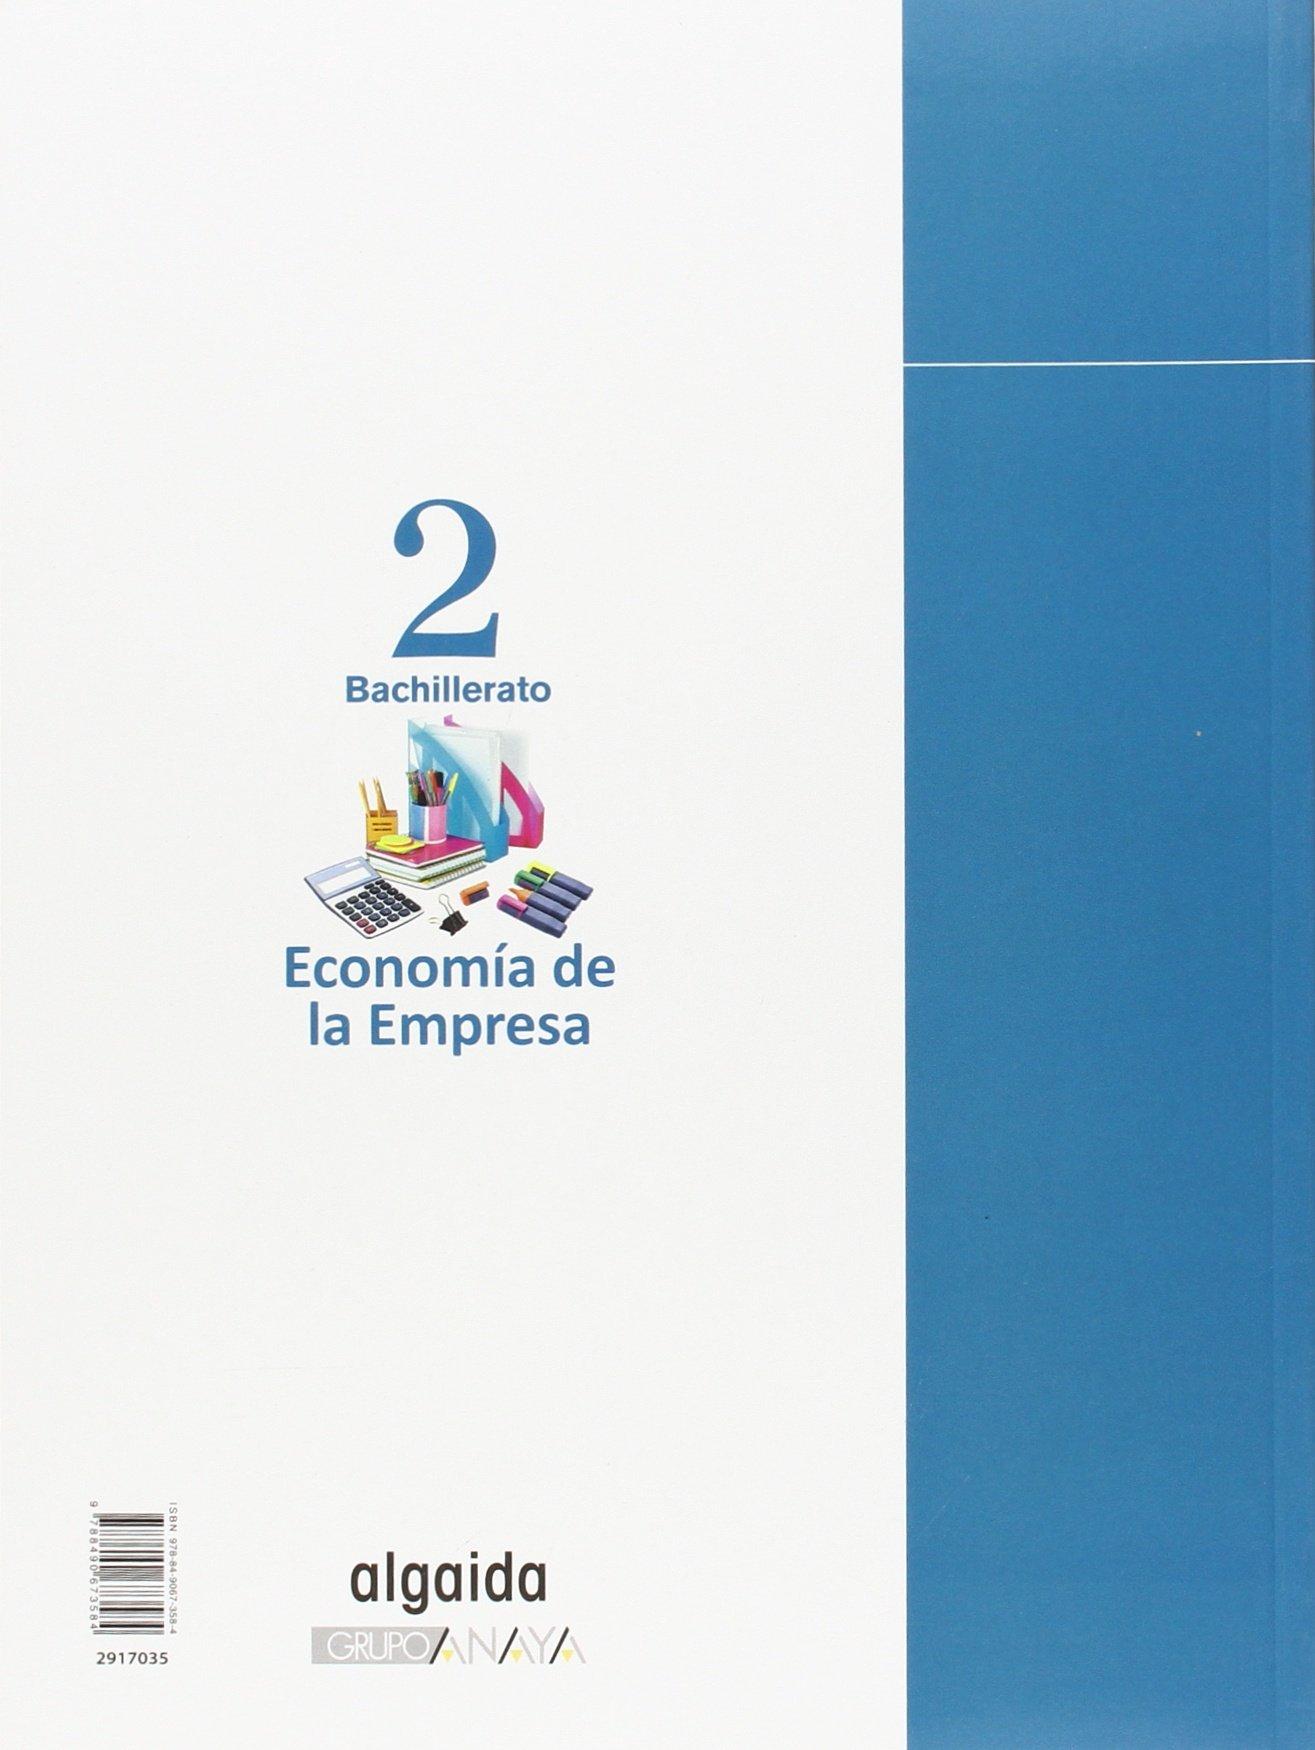 Economía de la empresa 2º Bachillerato - 9788490673584 Bachillerato L.O.G.S.E. 2º: Amazon.es: Ridao González, José Miguel: Libros